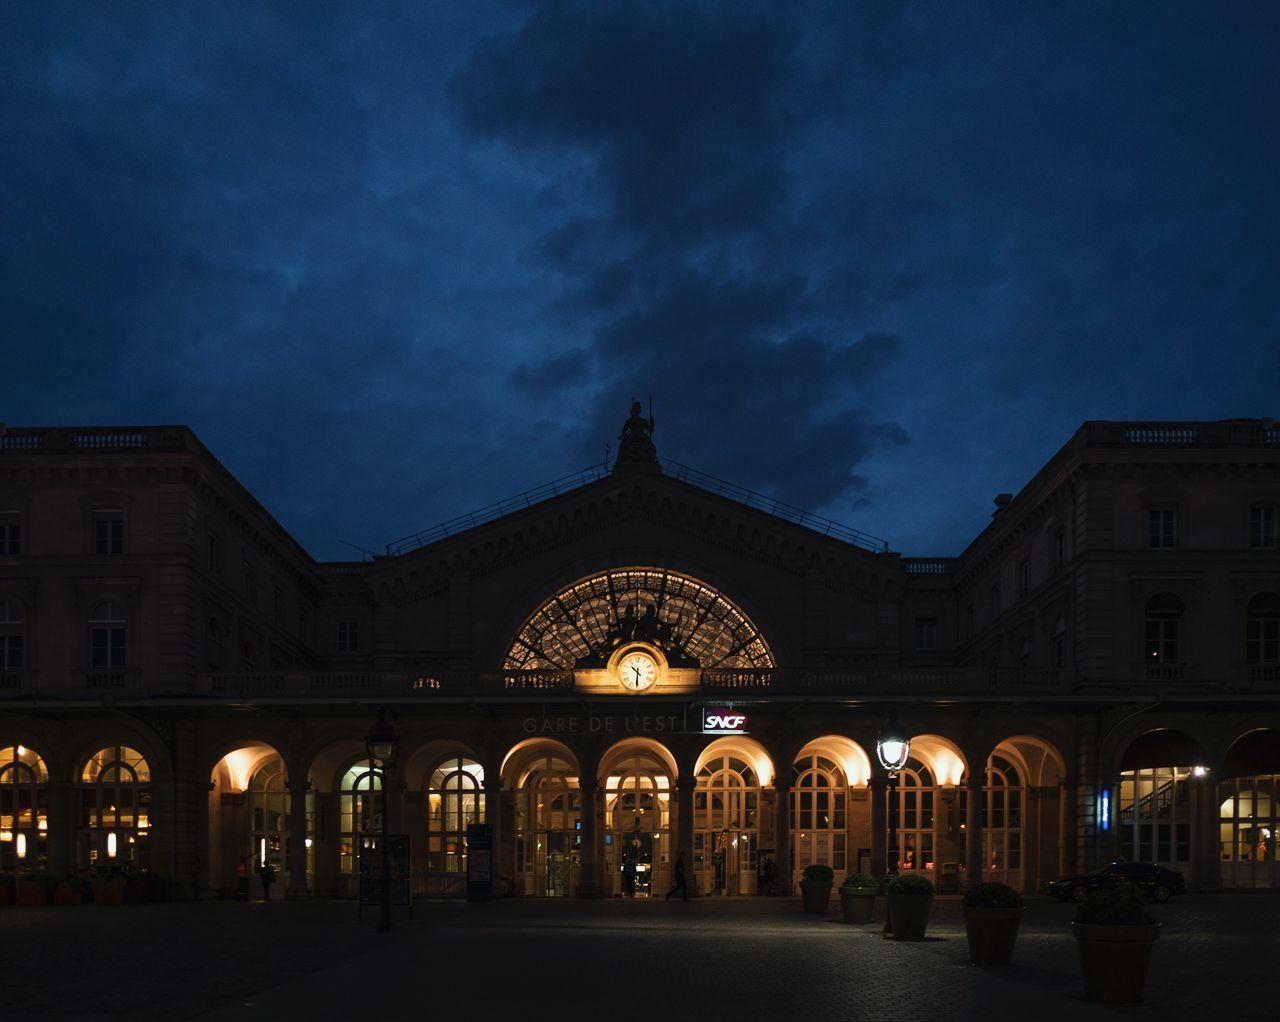 Architecture Astronomy City City Gate Cloud - Sky France Gare Du Nord Illuminated Night No People Outdoors Paris Paris, France  Sky Travel